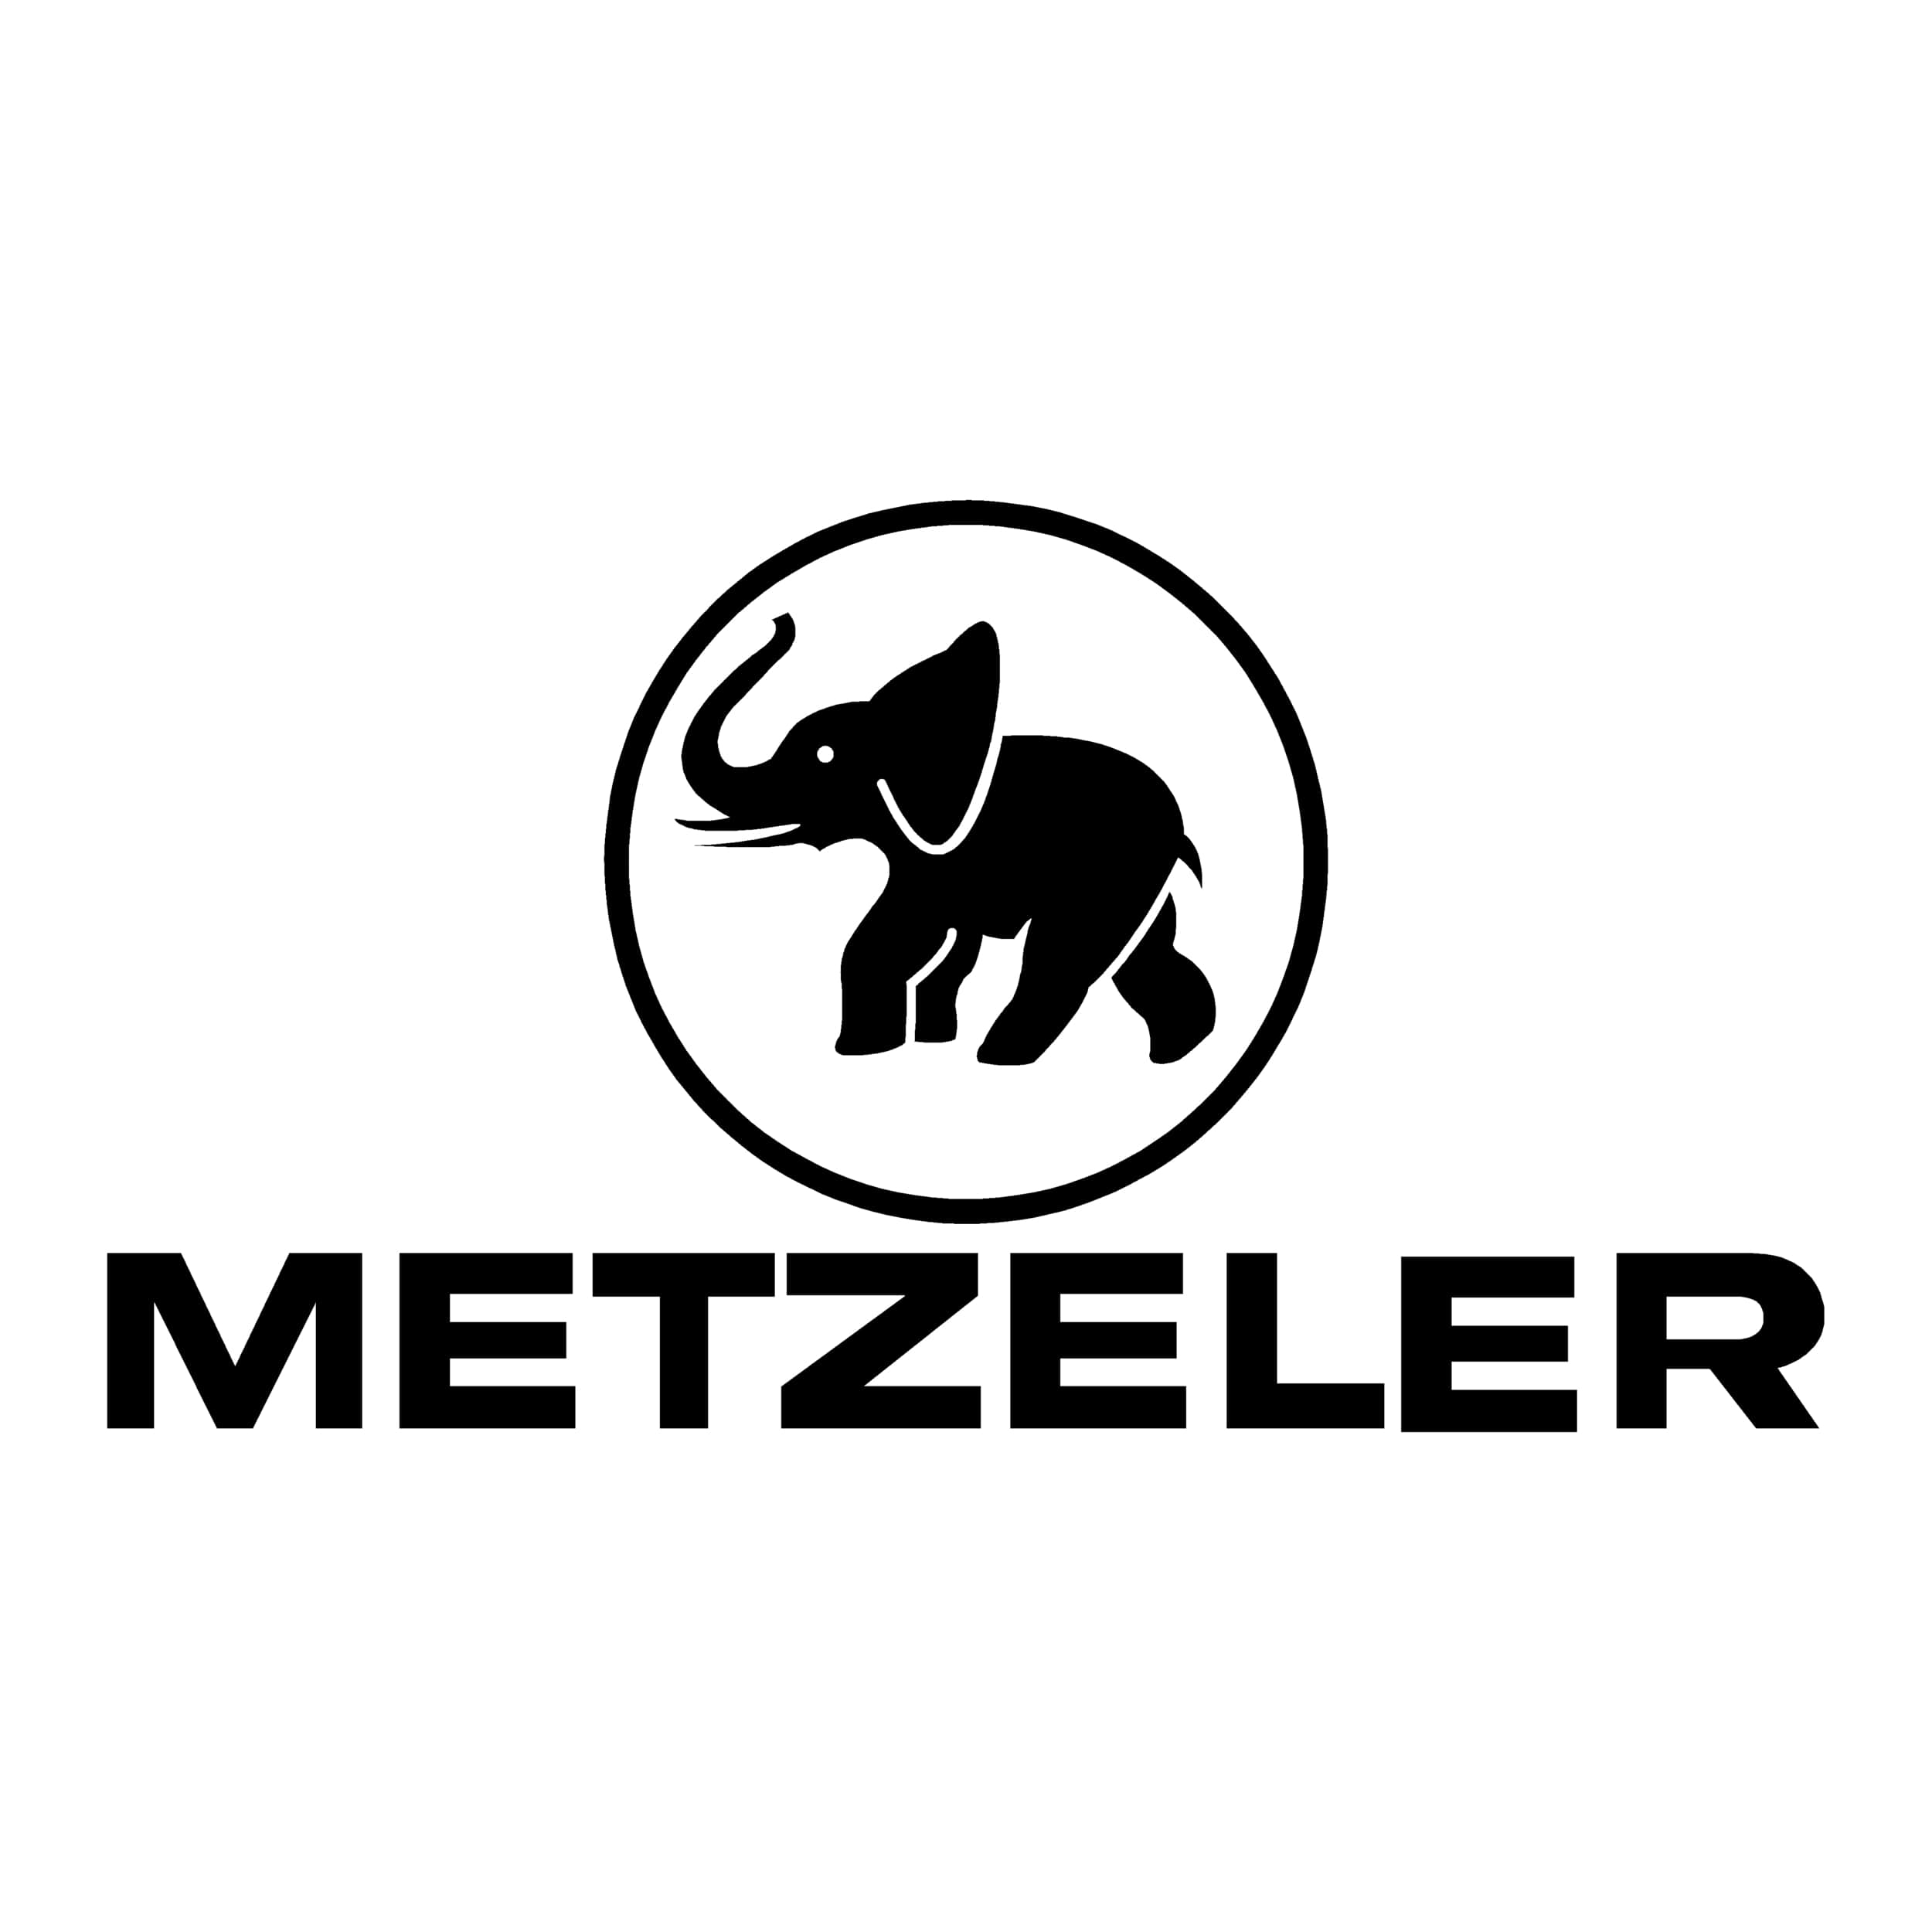 sticker-metzeler-ref-2-tuning-audio-sonorisation-car-auto-moto-camion-competition-deco-rallye-autocollant-min